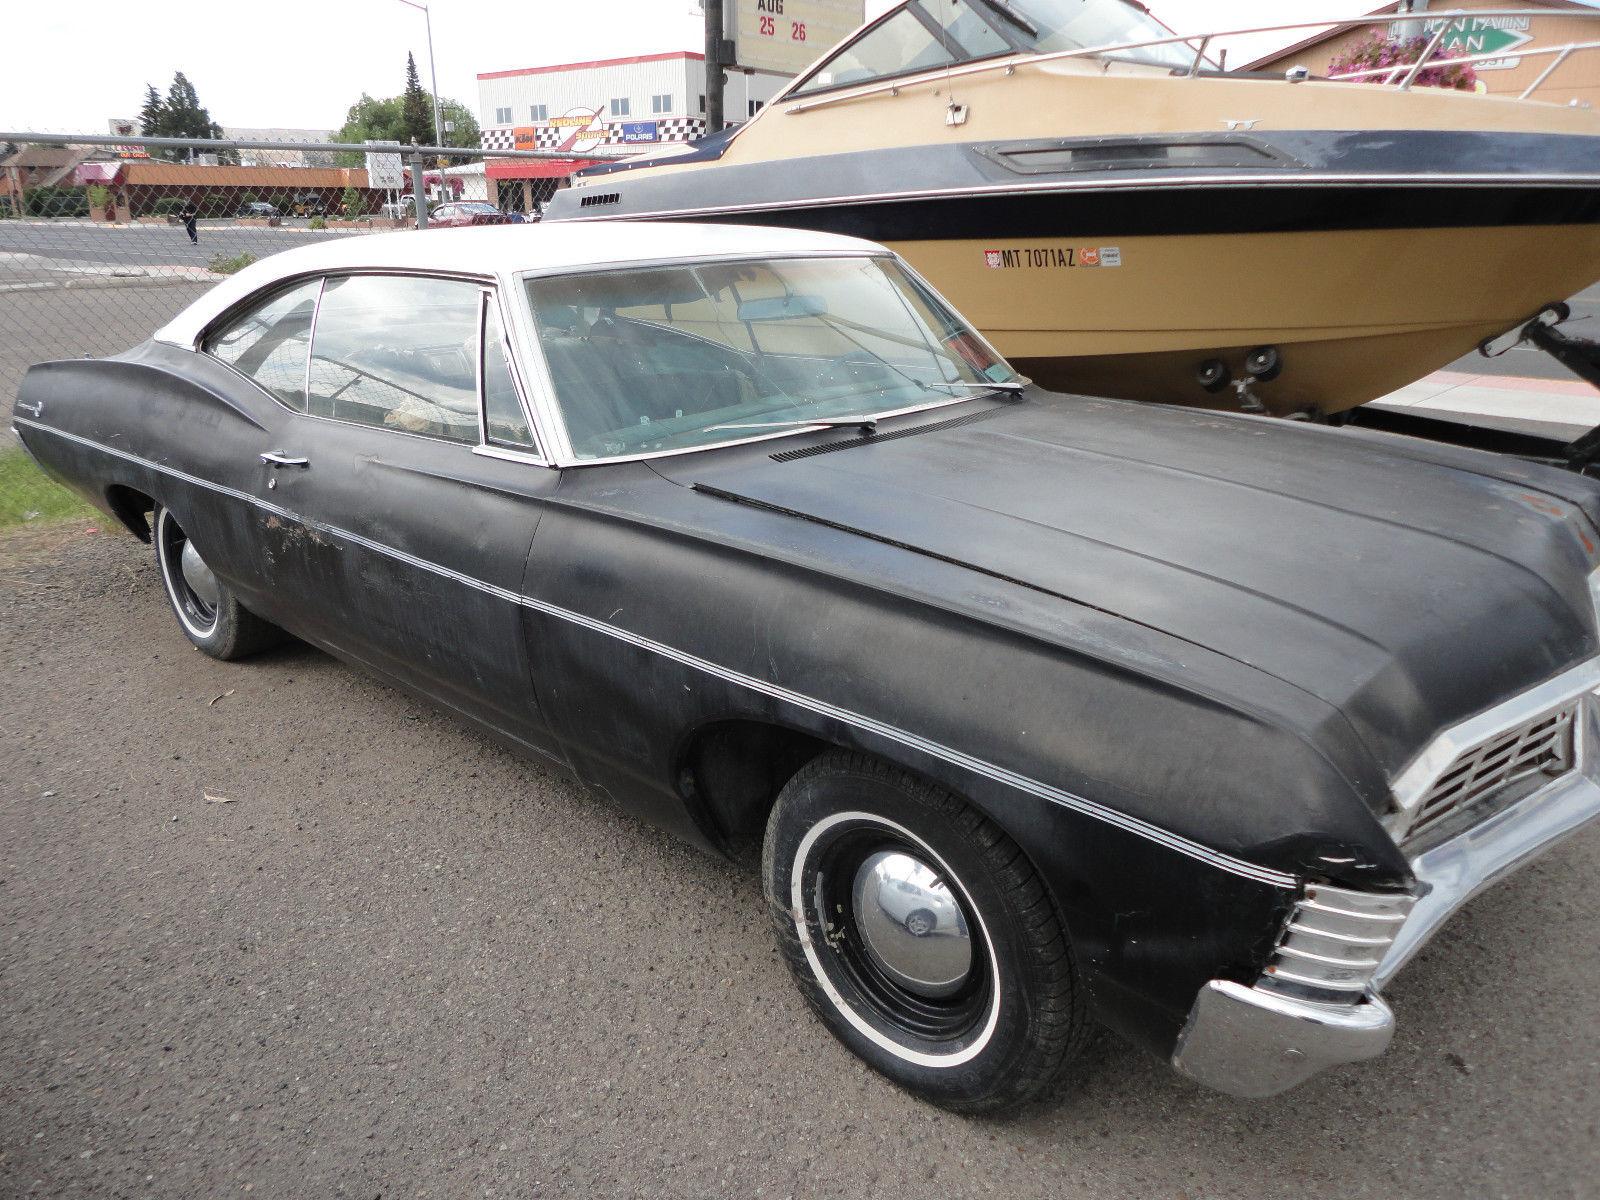 1967 chevrolet impala classic chevrolet impala 1967 for sale. Black Bedroom Furniture Sets. Home Design Ideas